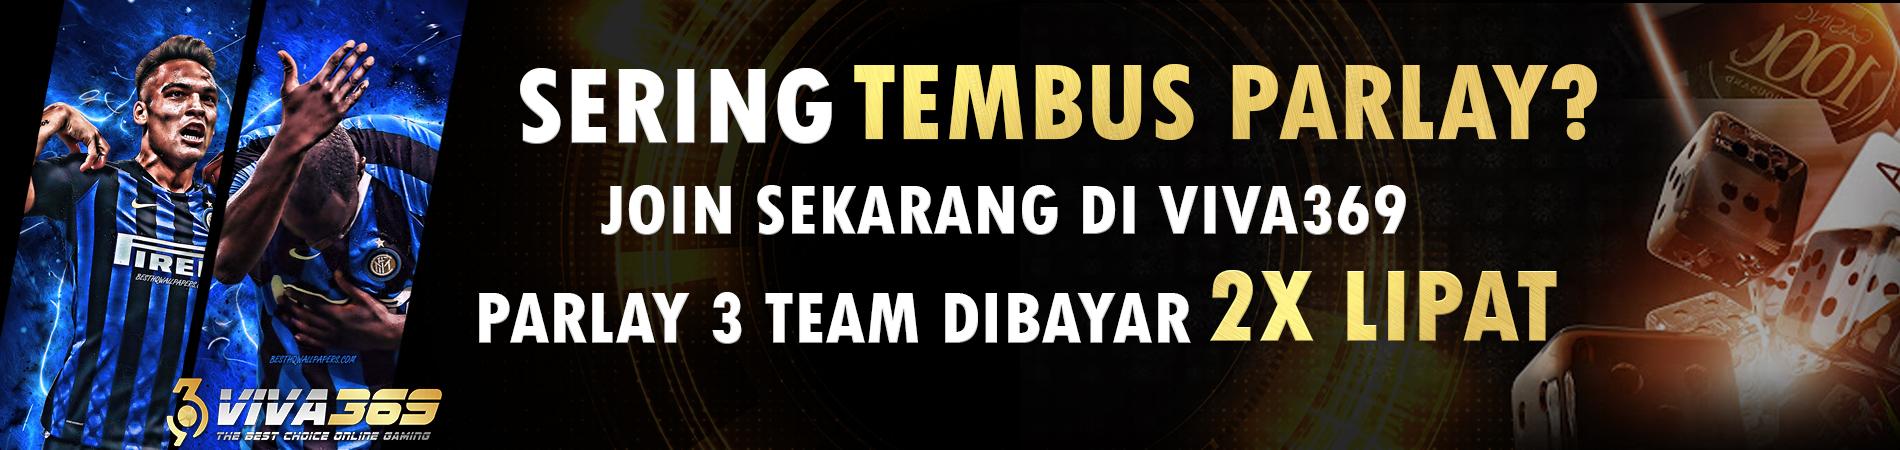 Mix Parlay 3 Team